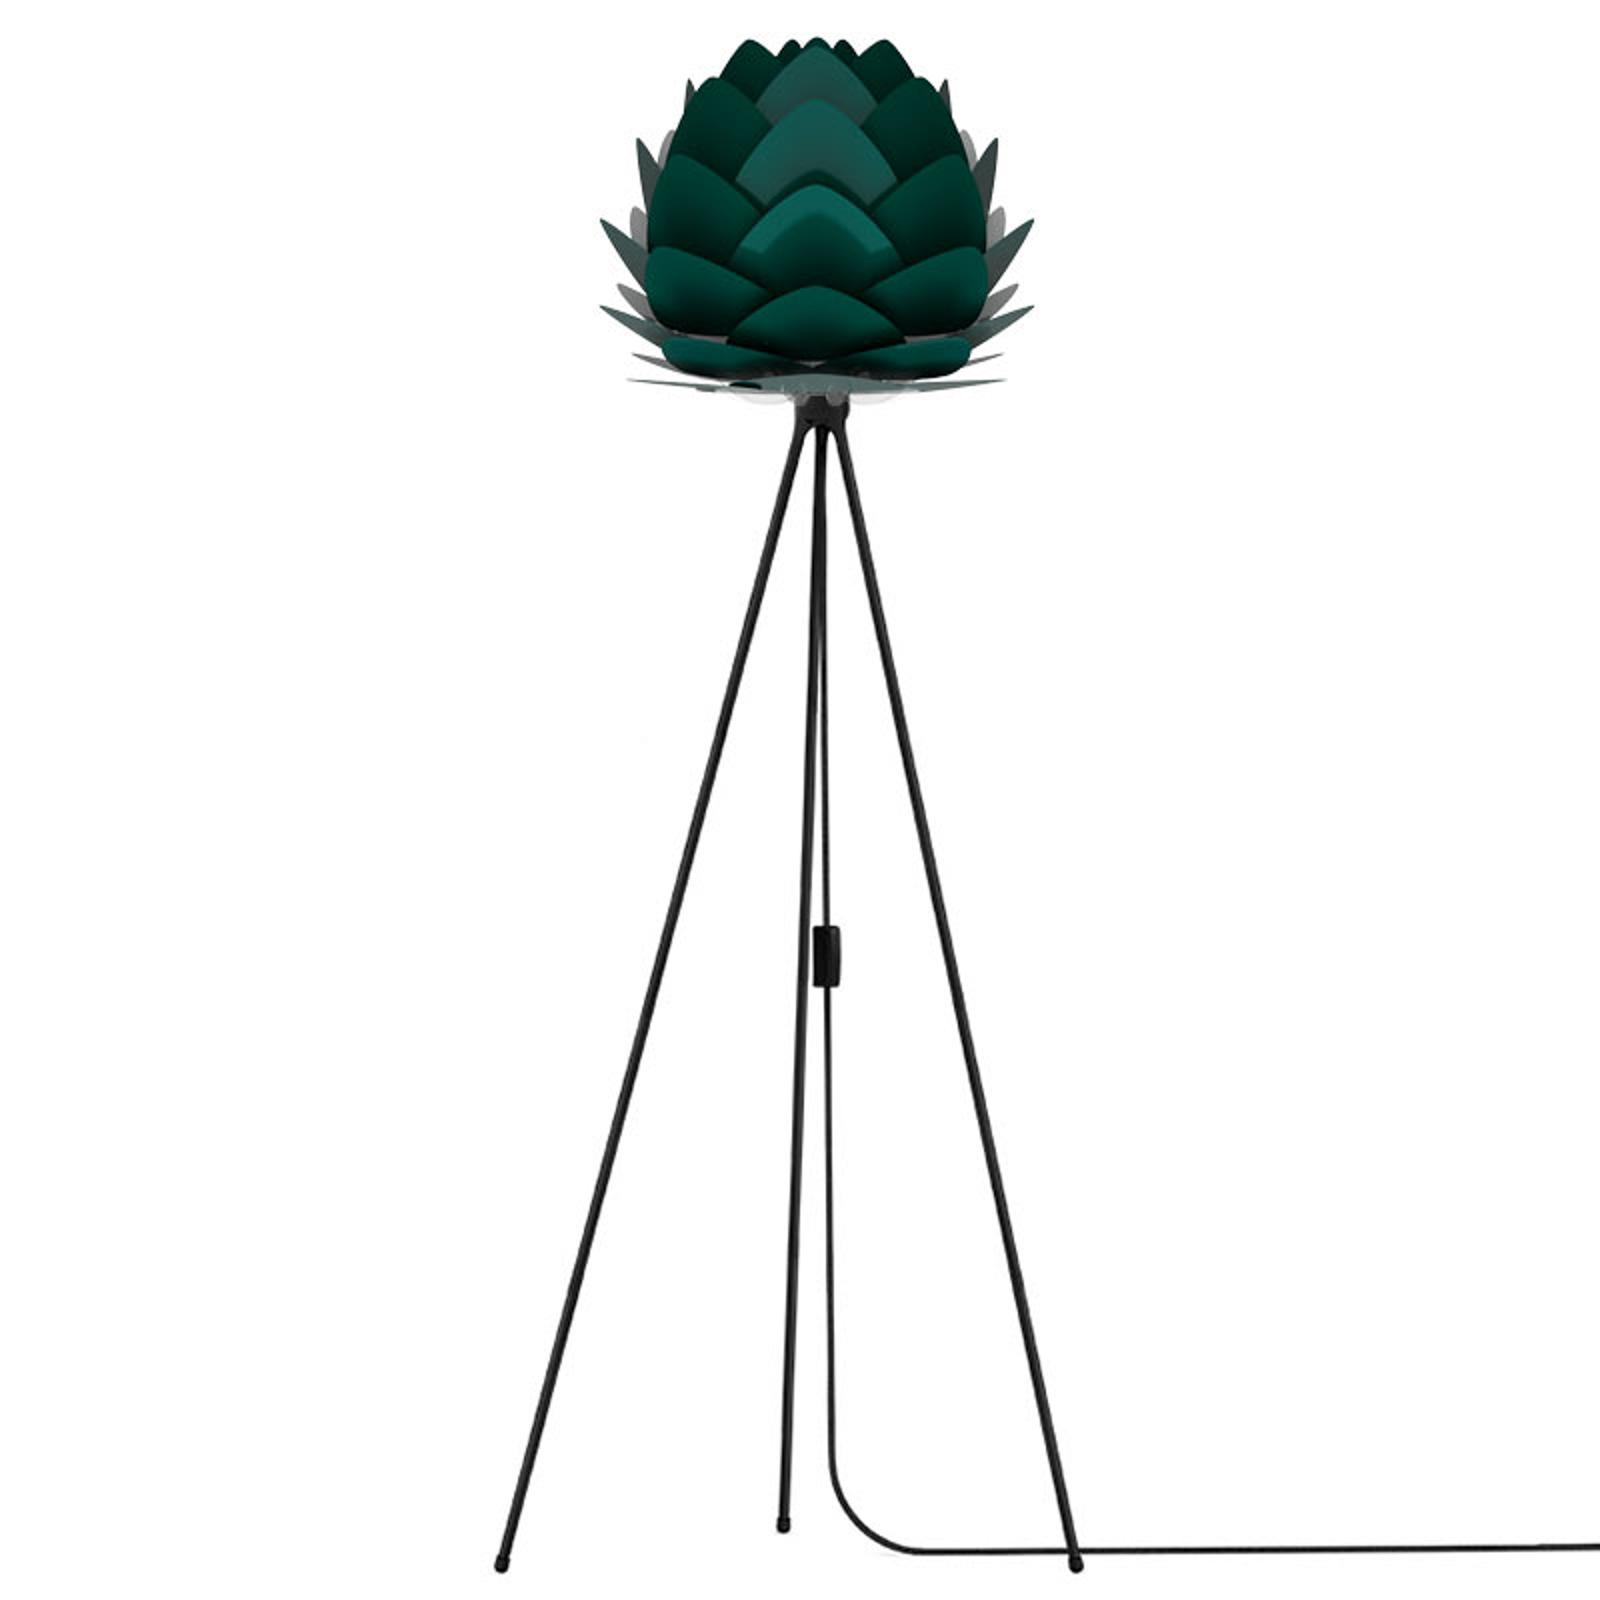 UMAGE Aluvia mini vloerlamp zwart/groen